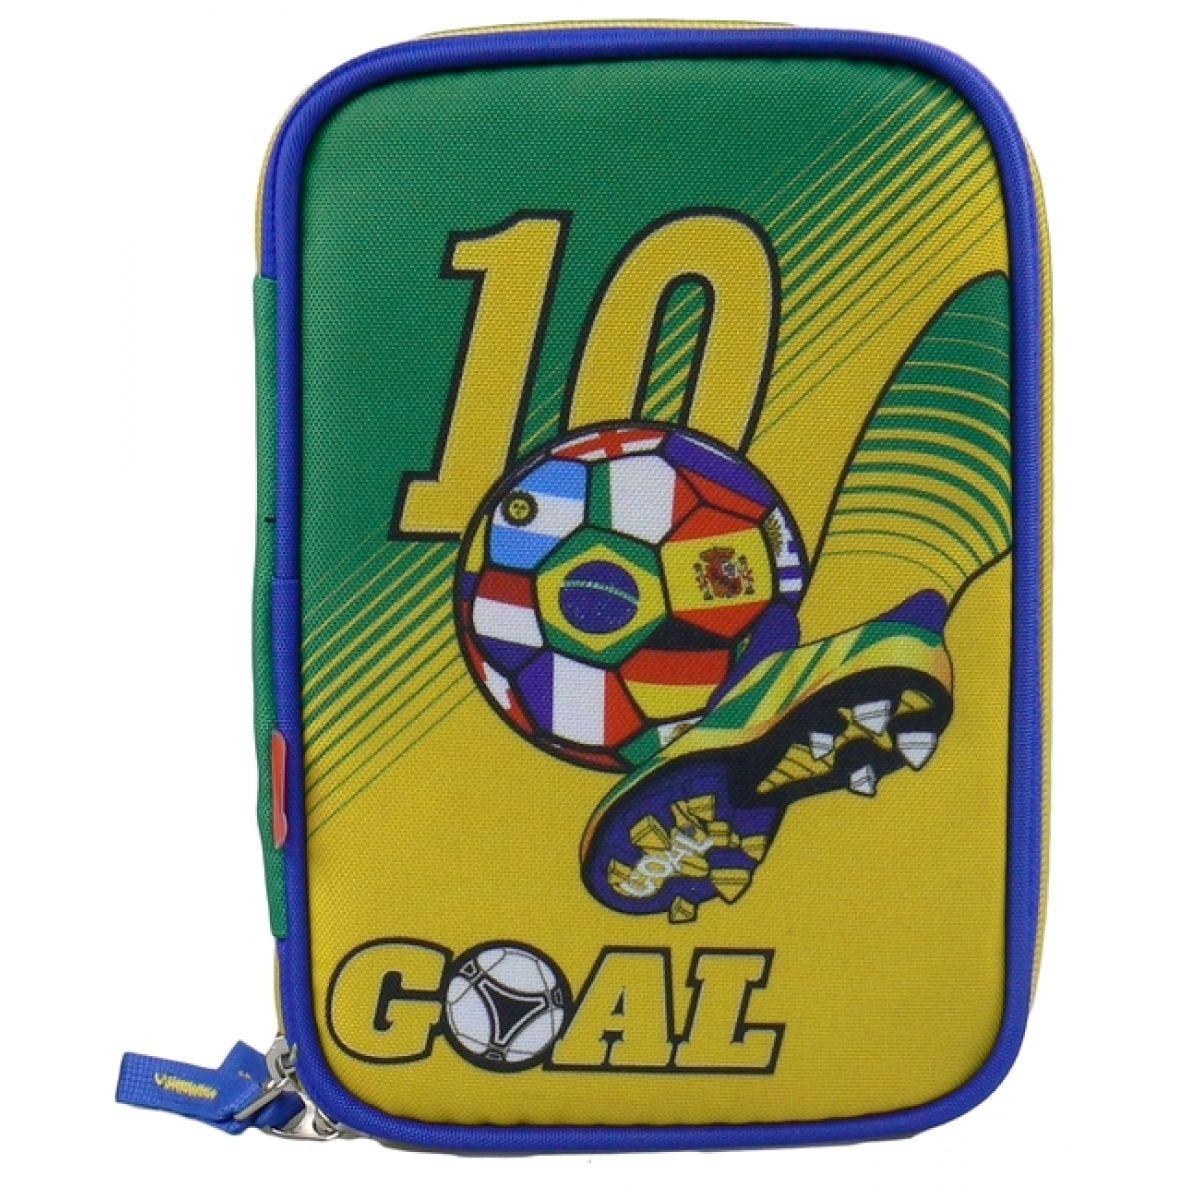 Target Penál Fotbal žluto zelený Plně vybavený